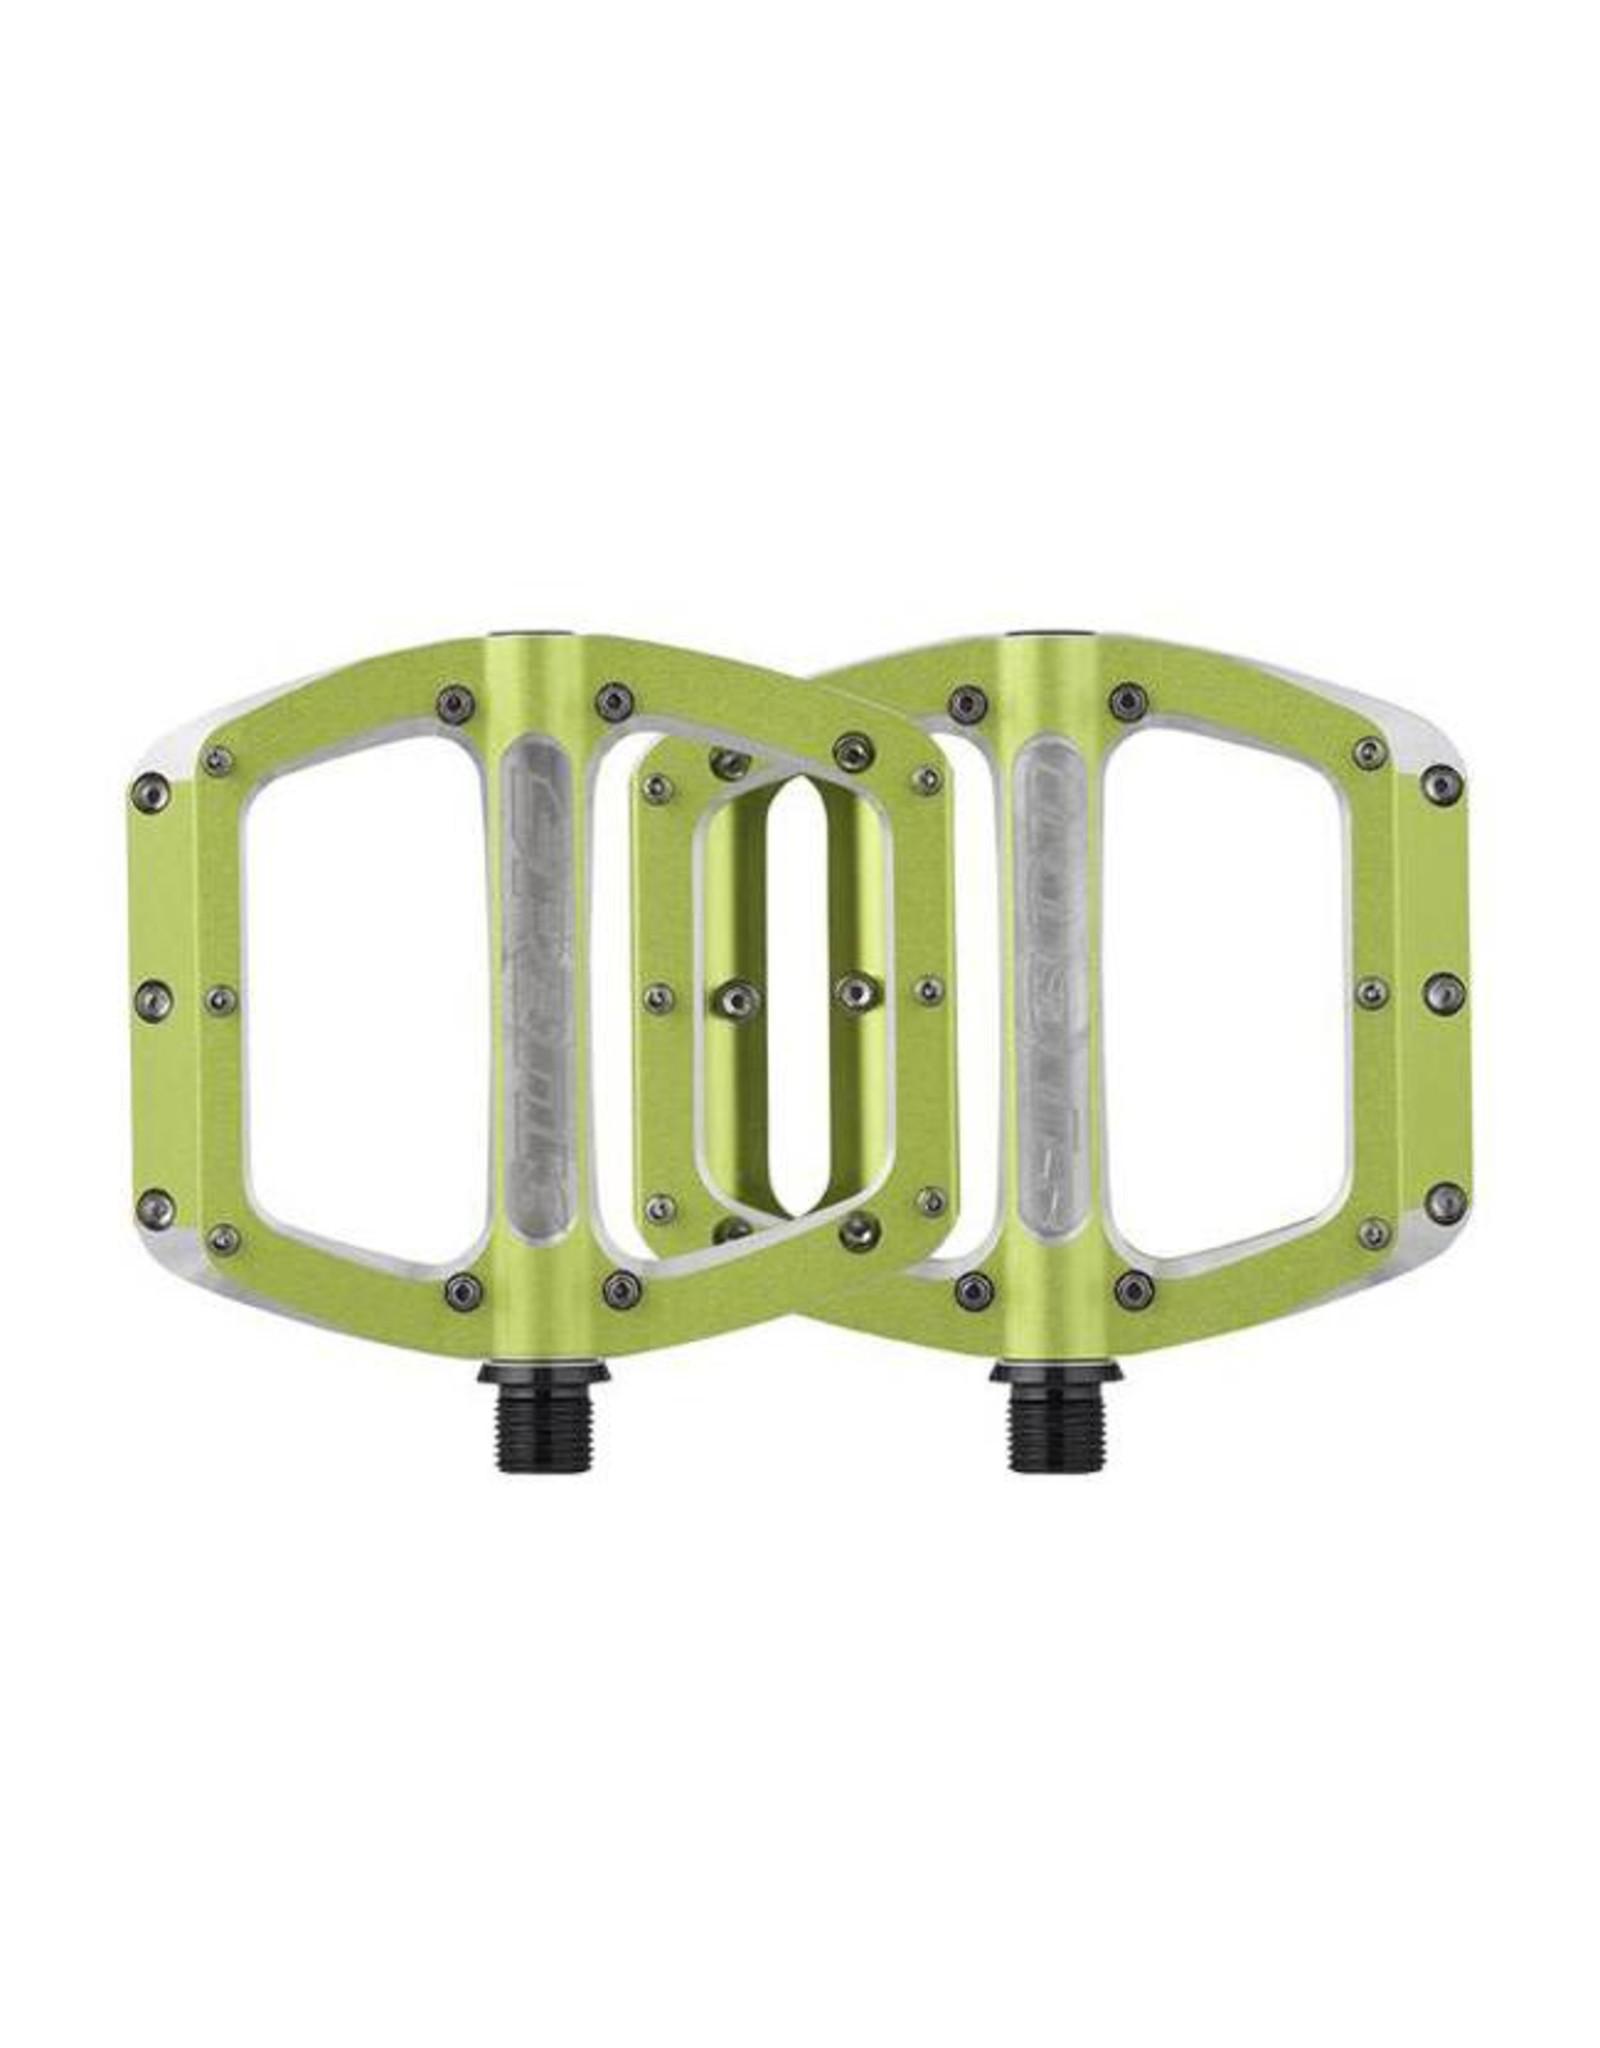 Spank Spank Spoon Medium (100mm) Pedals, Green